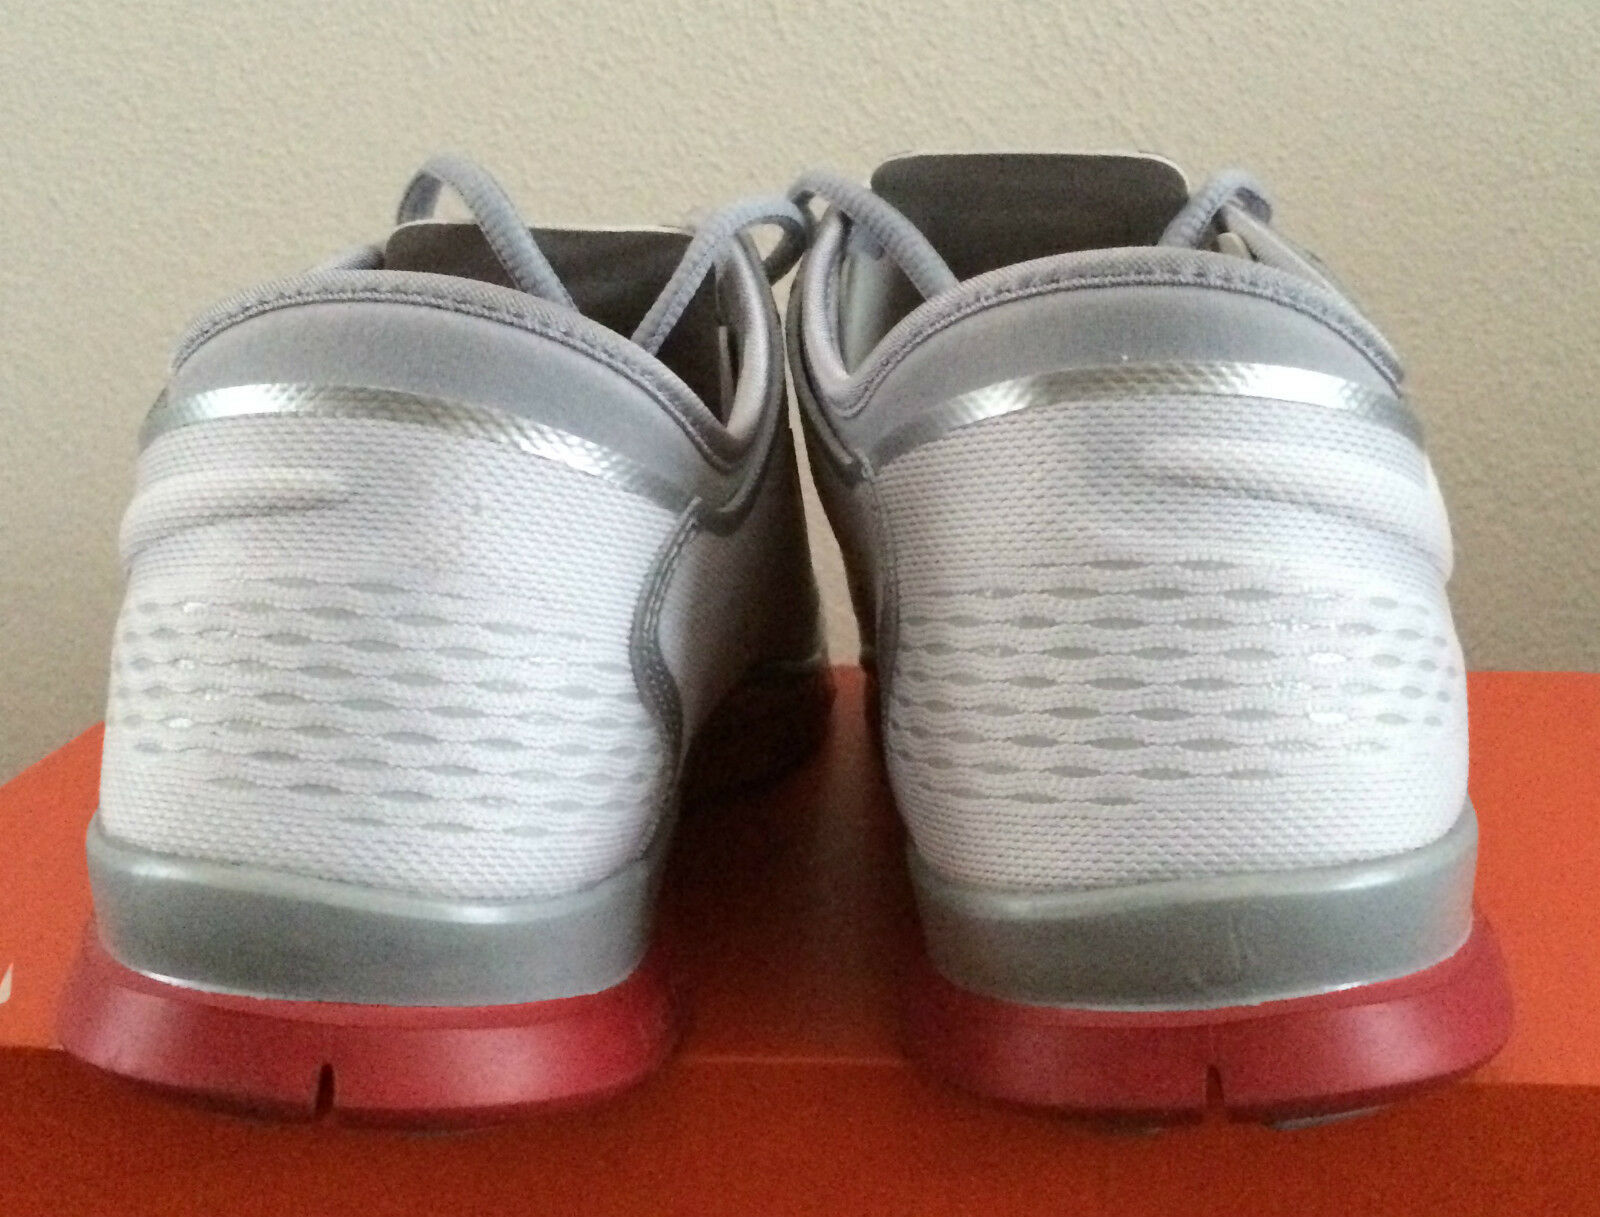 Damenschuhe Größe 15 WEISS ROT Nike Free 5.0 TR Fit 4 Team Athletic Schuhes 642069 109